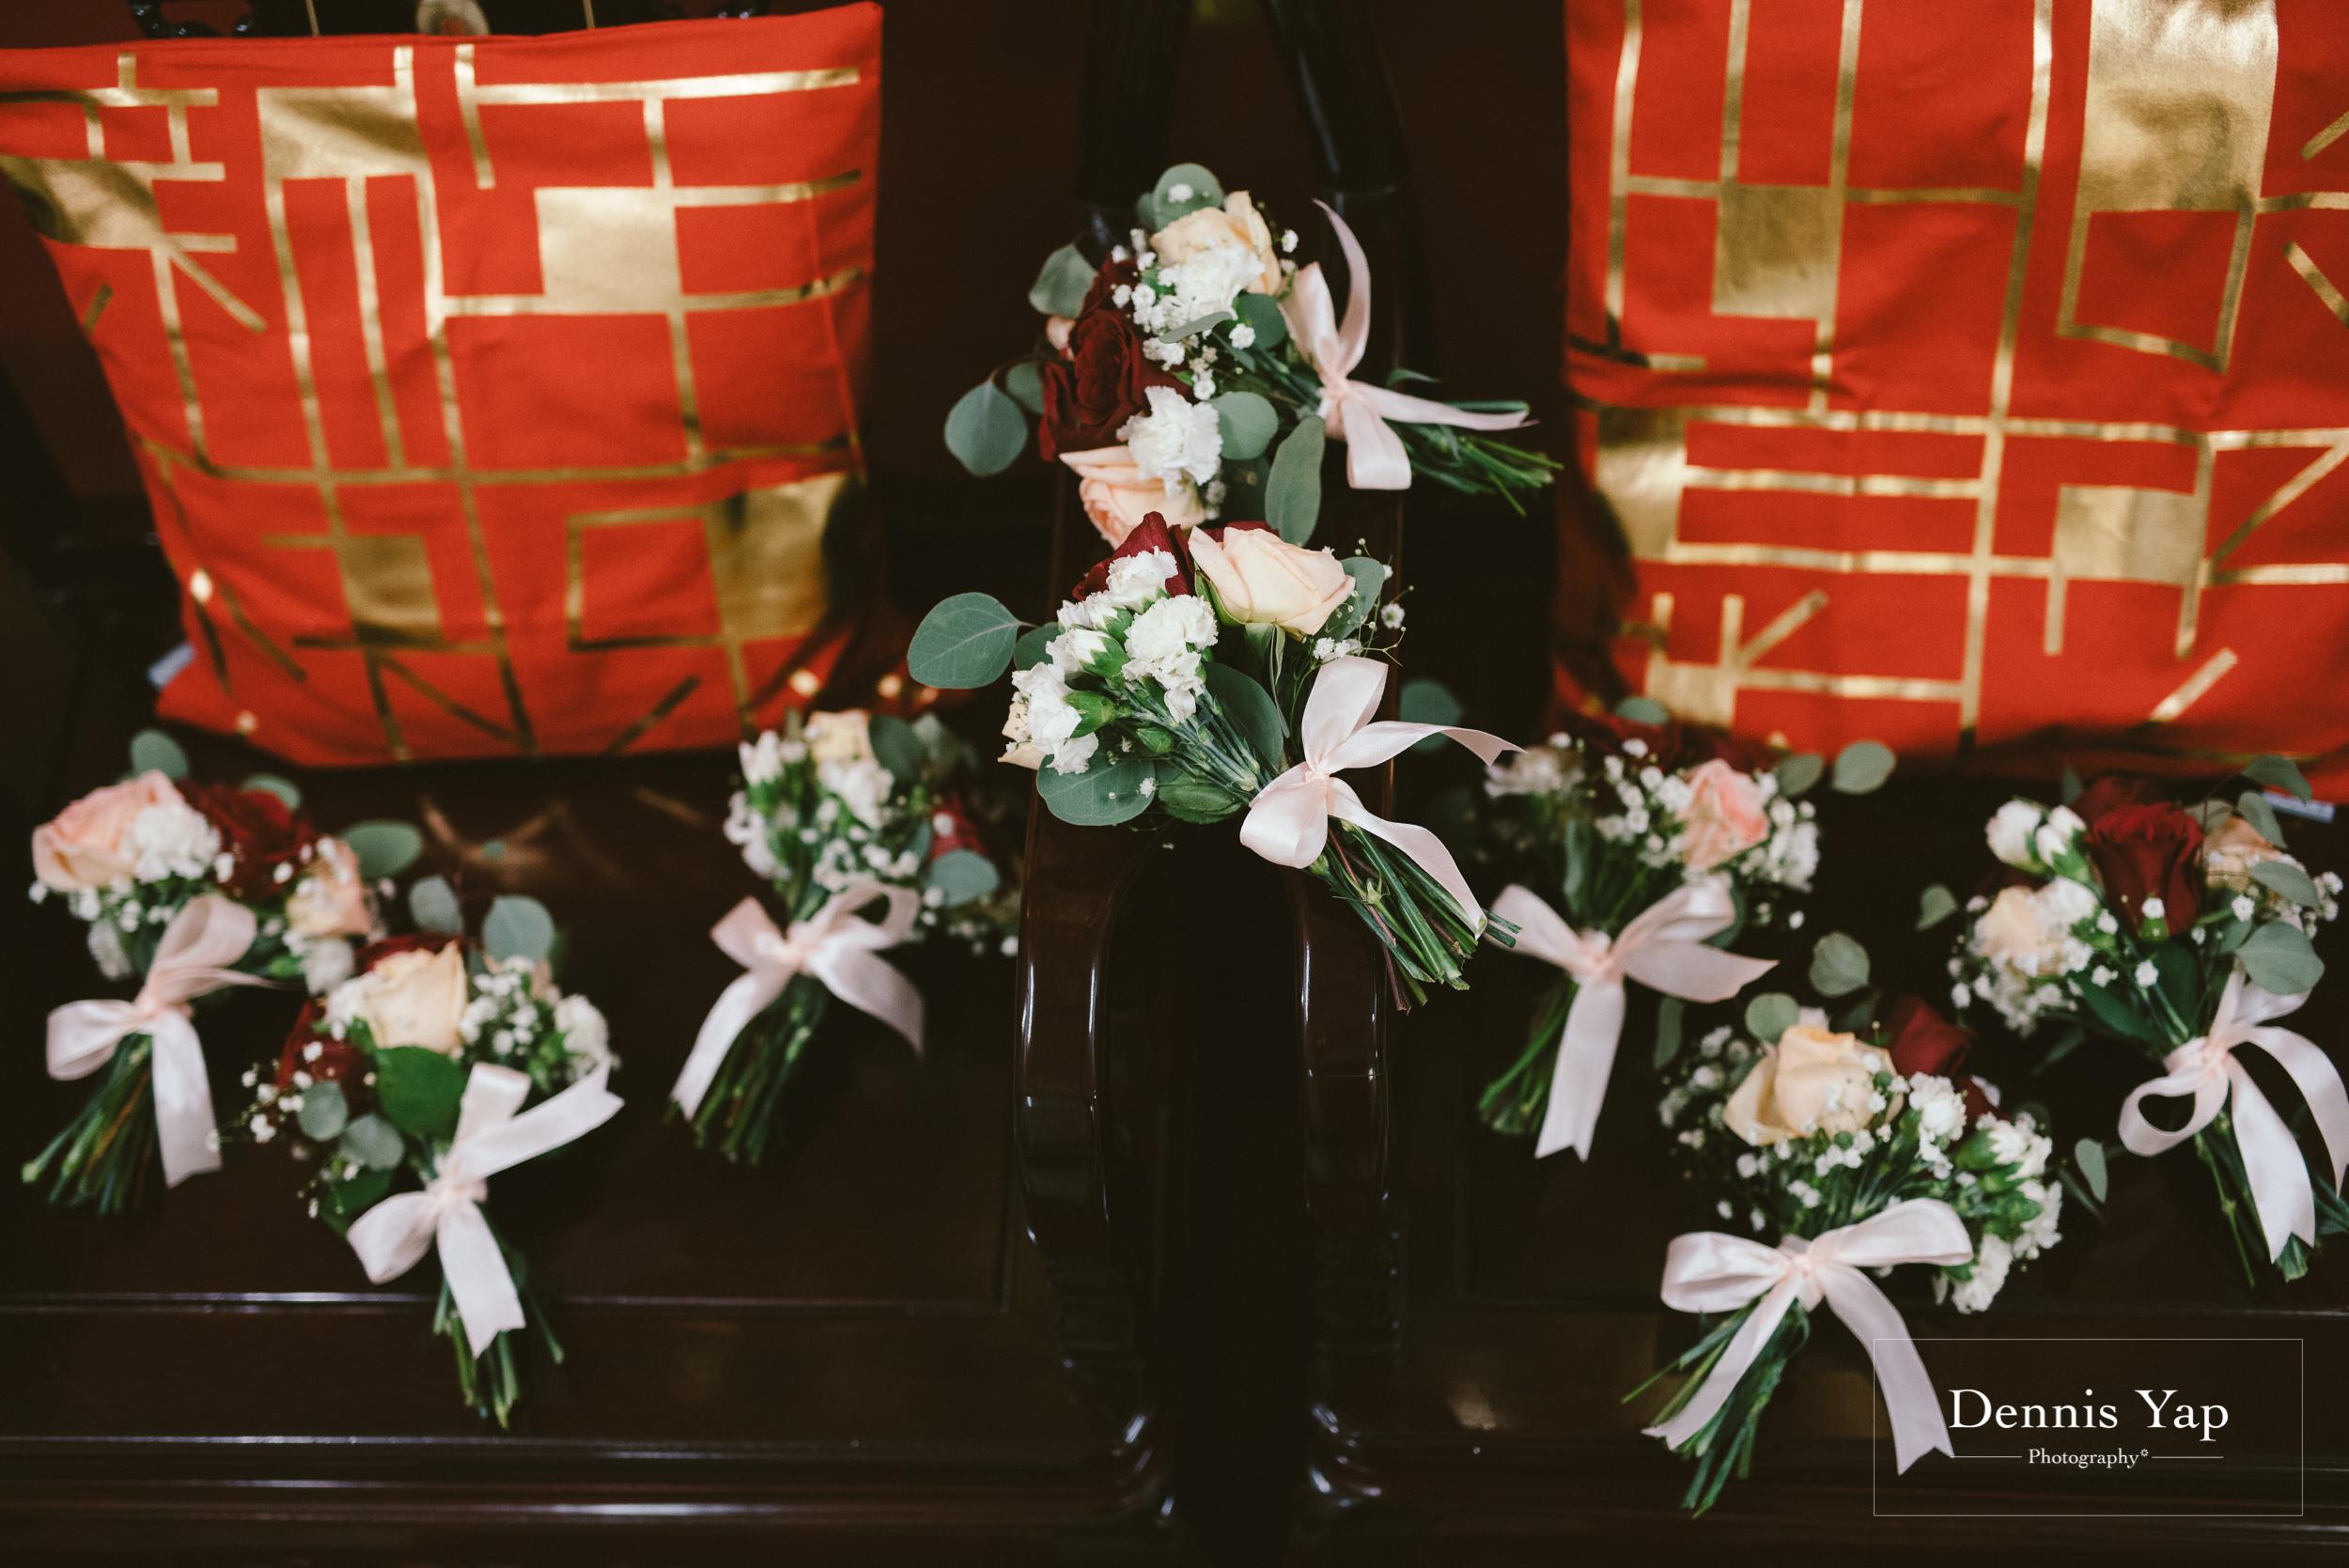 justin hsin wedding day ciao ristorante kuala lumpur dennis yap photography-3.jpg